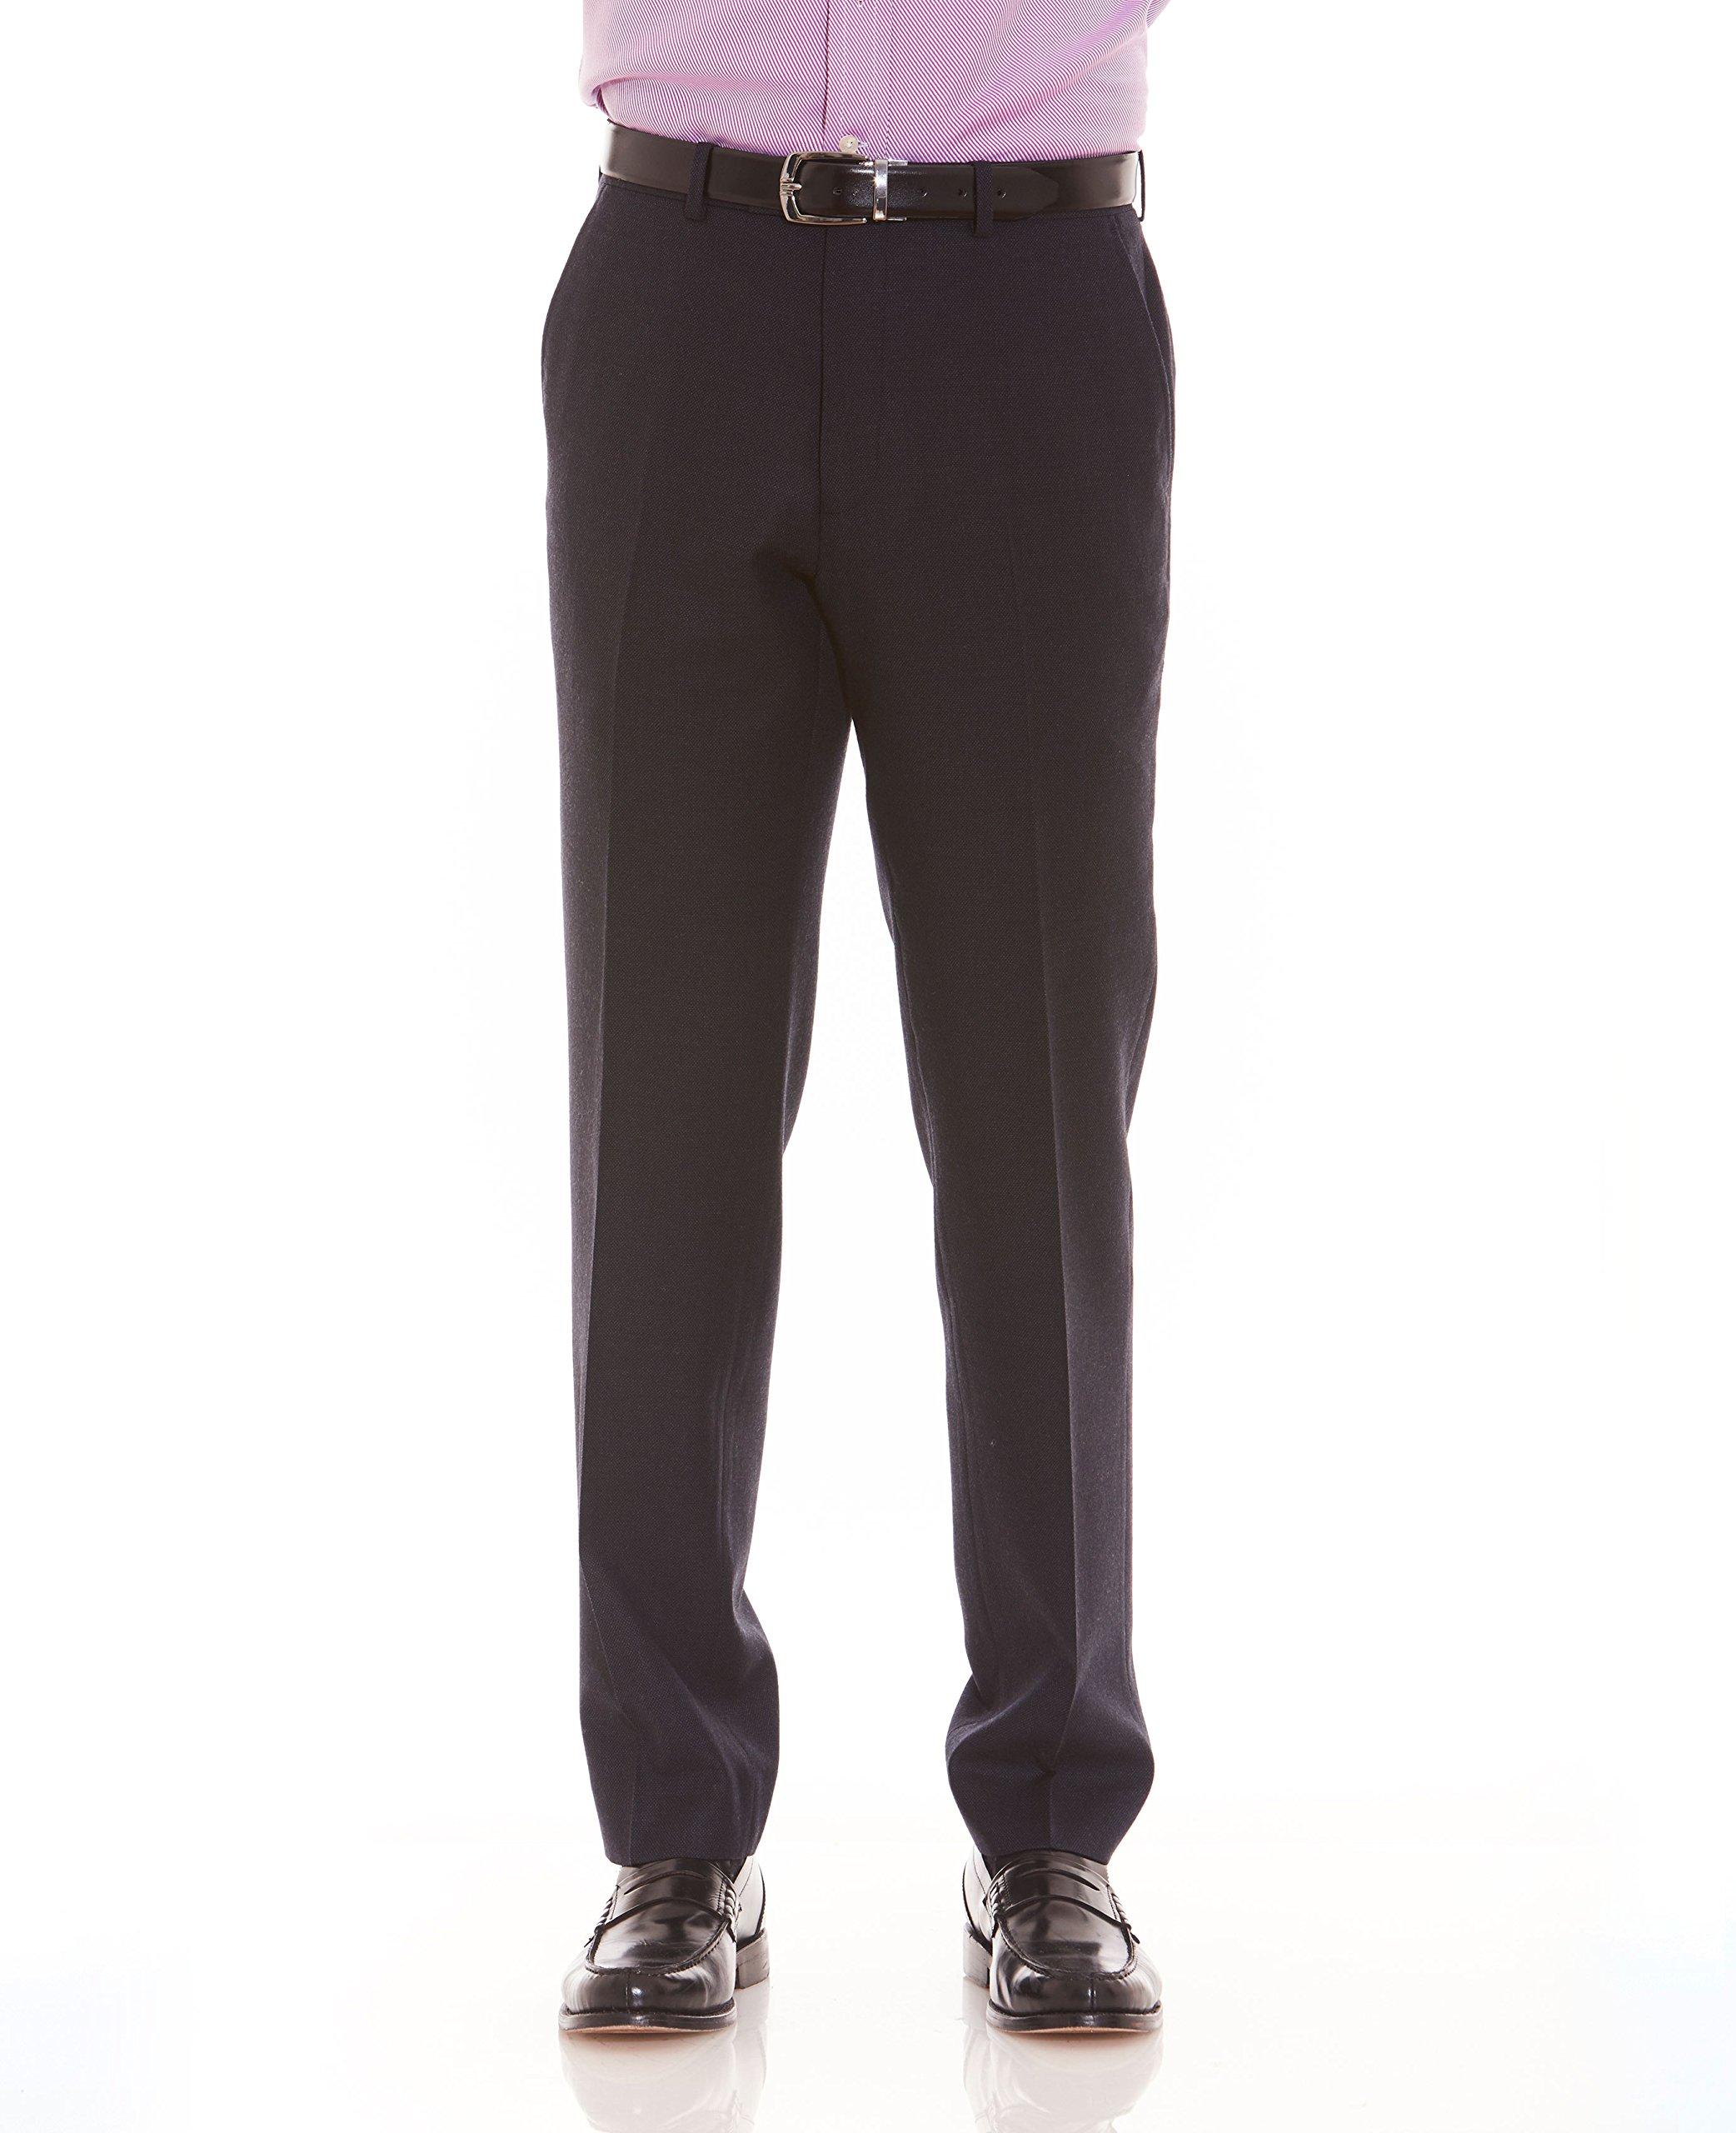 The Savile Row Company Savile Row Men's Charcoal Birdseye Tailored Business Dress Pant 40'' 32'' by The Savile Row Company